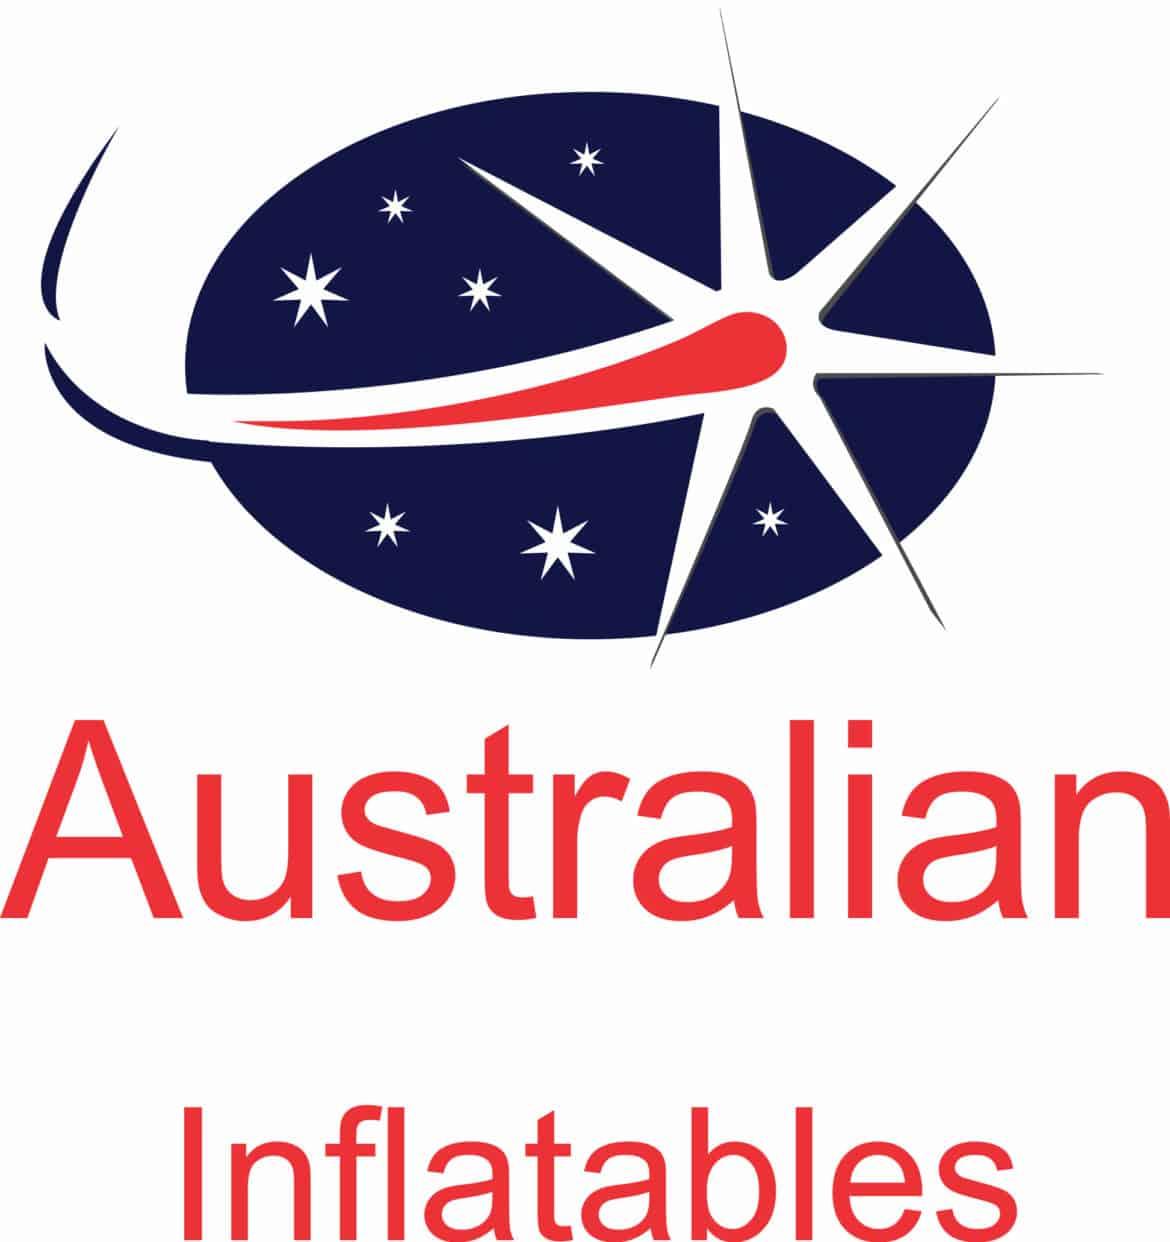 Australian inflatables logo